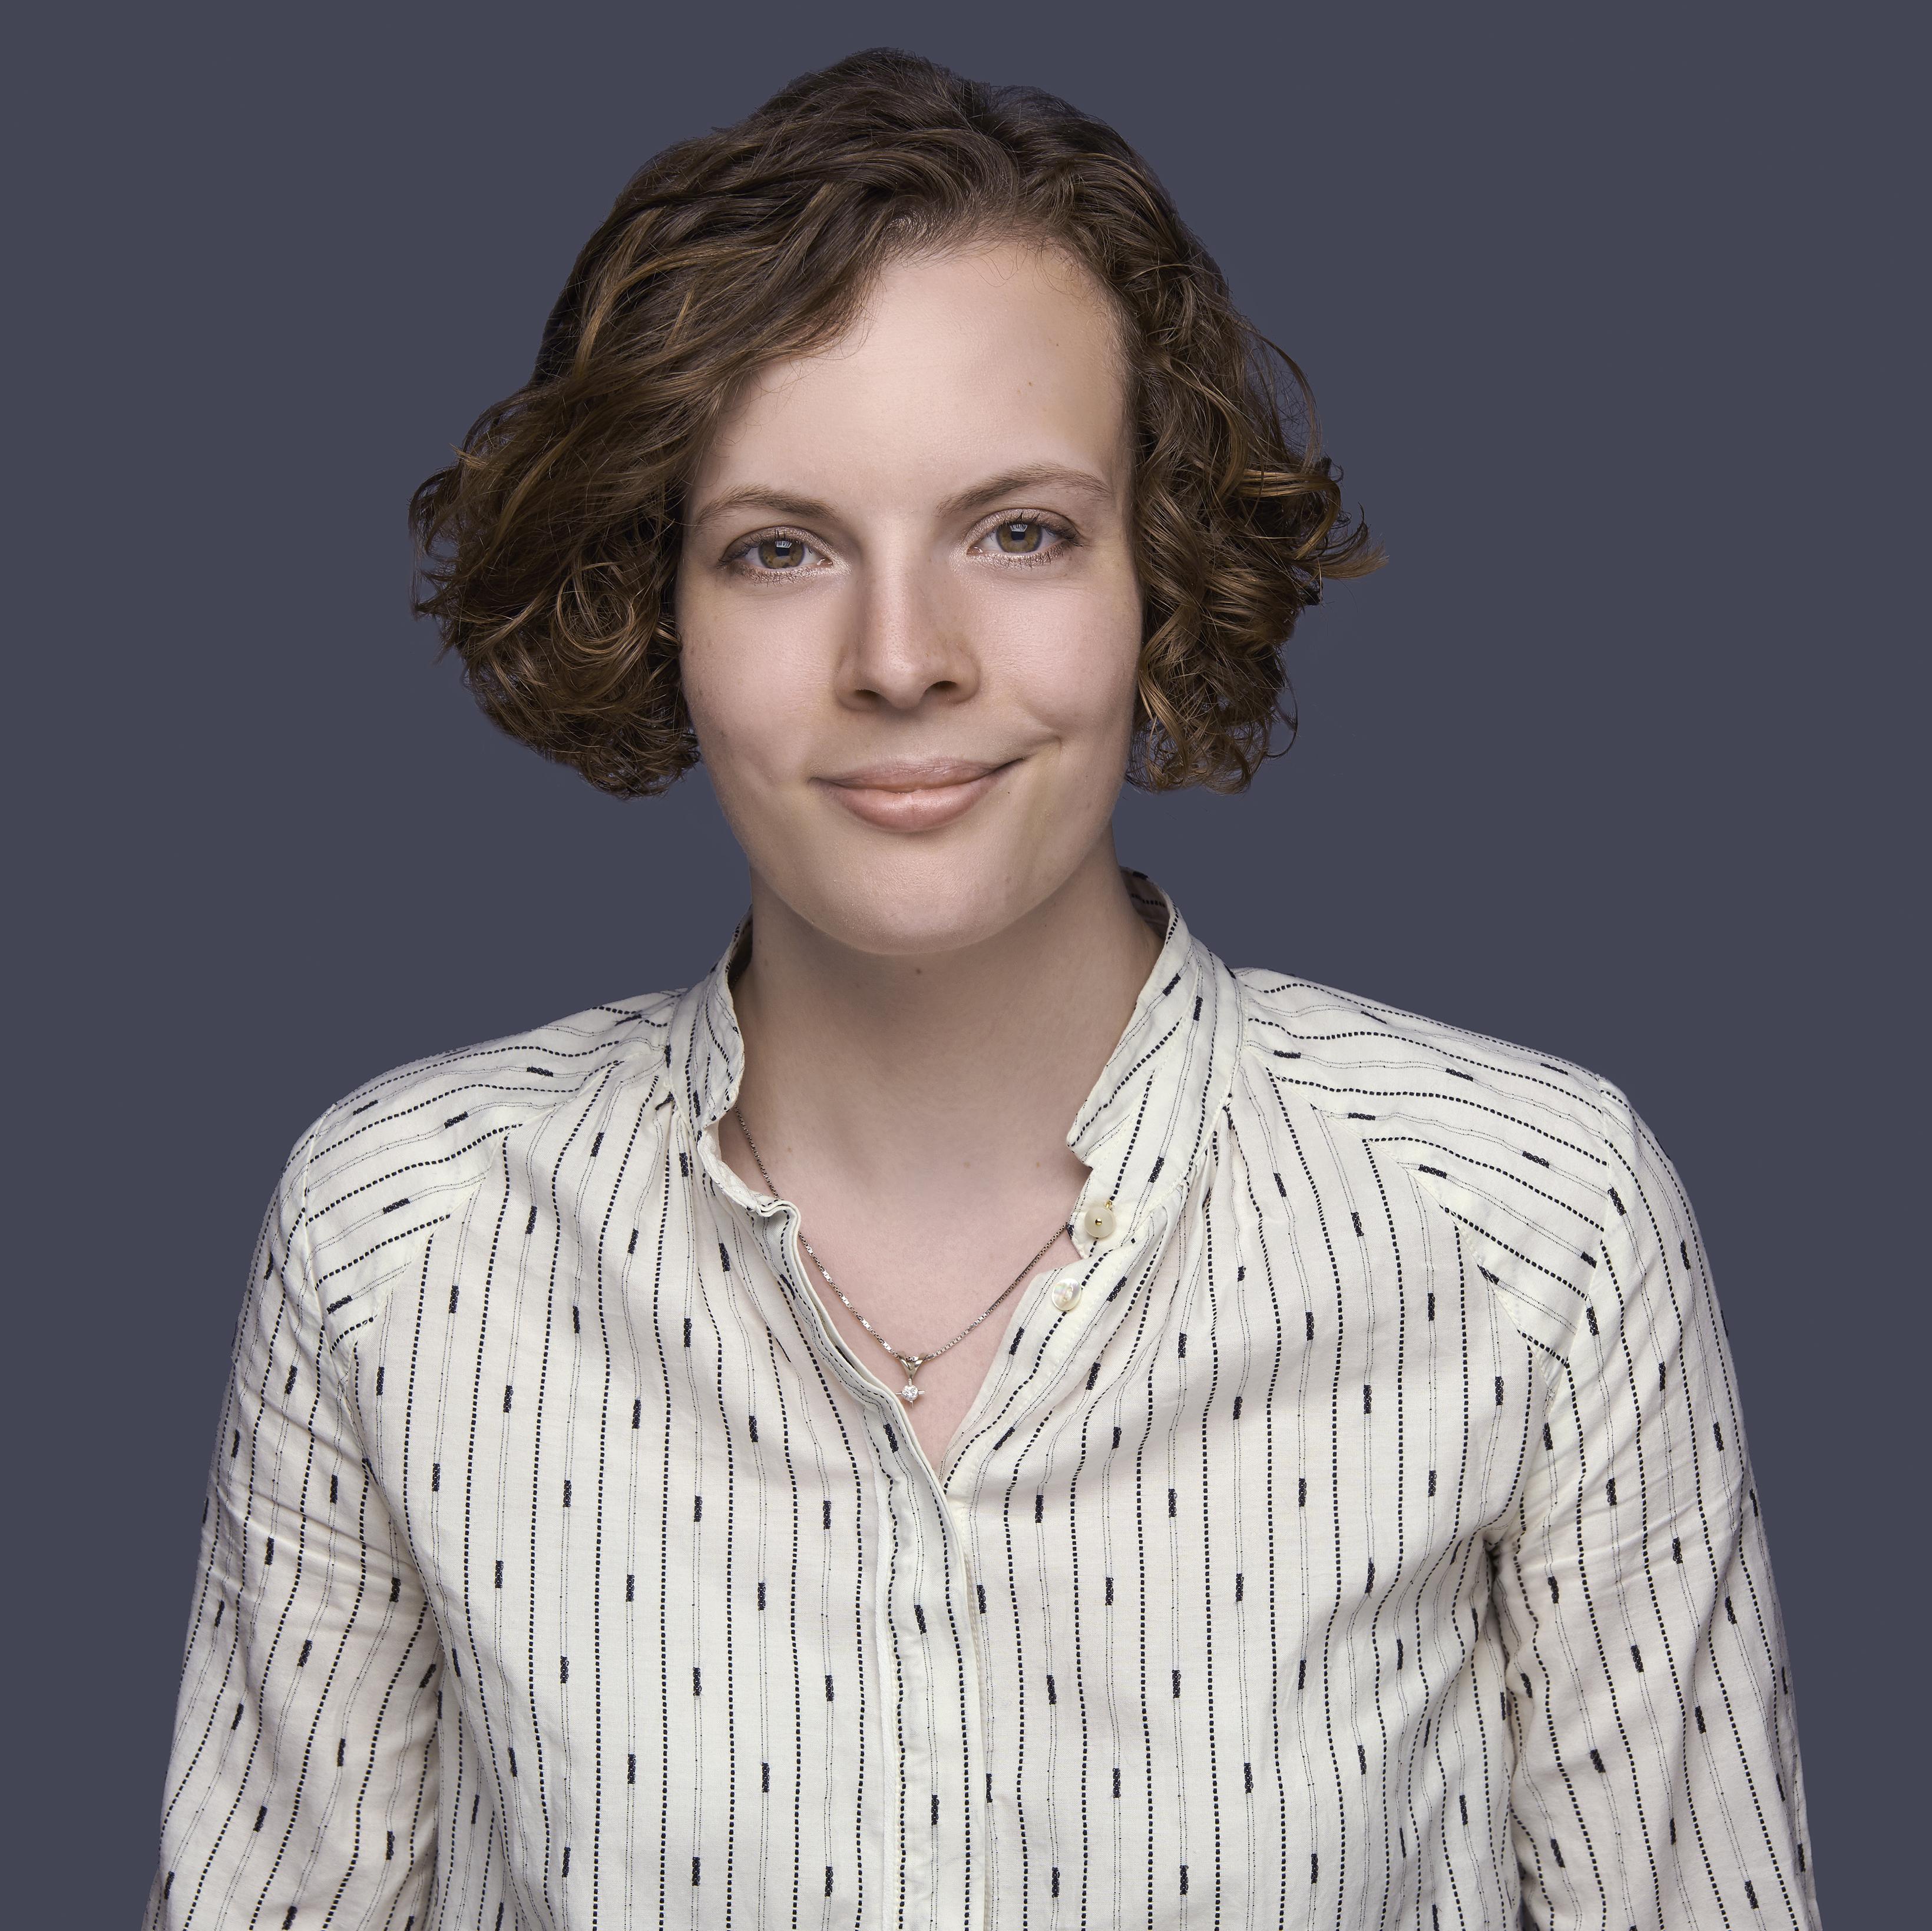 Kathrine Marie Schledermann